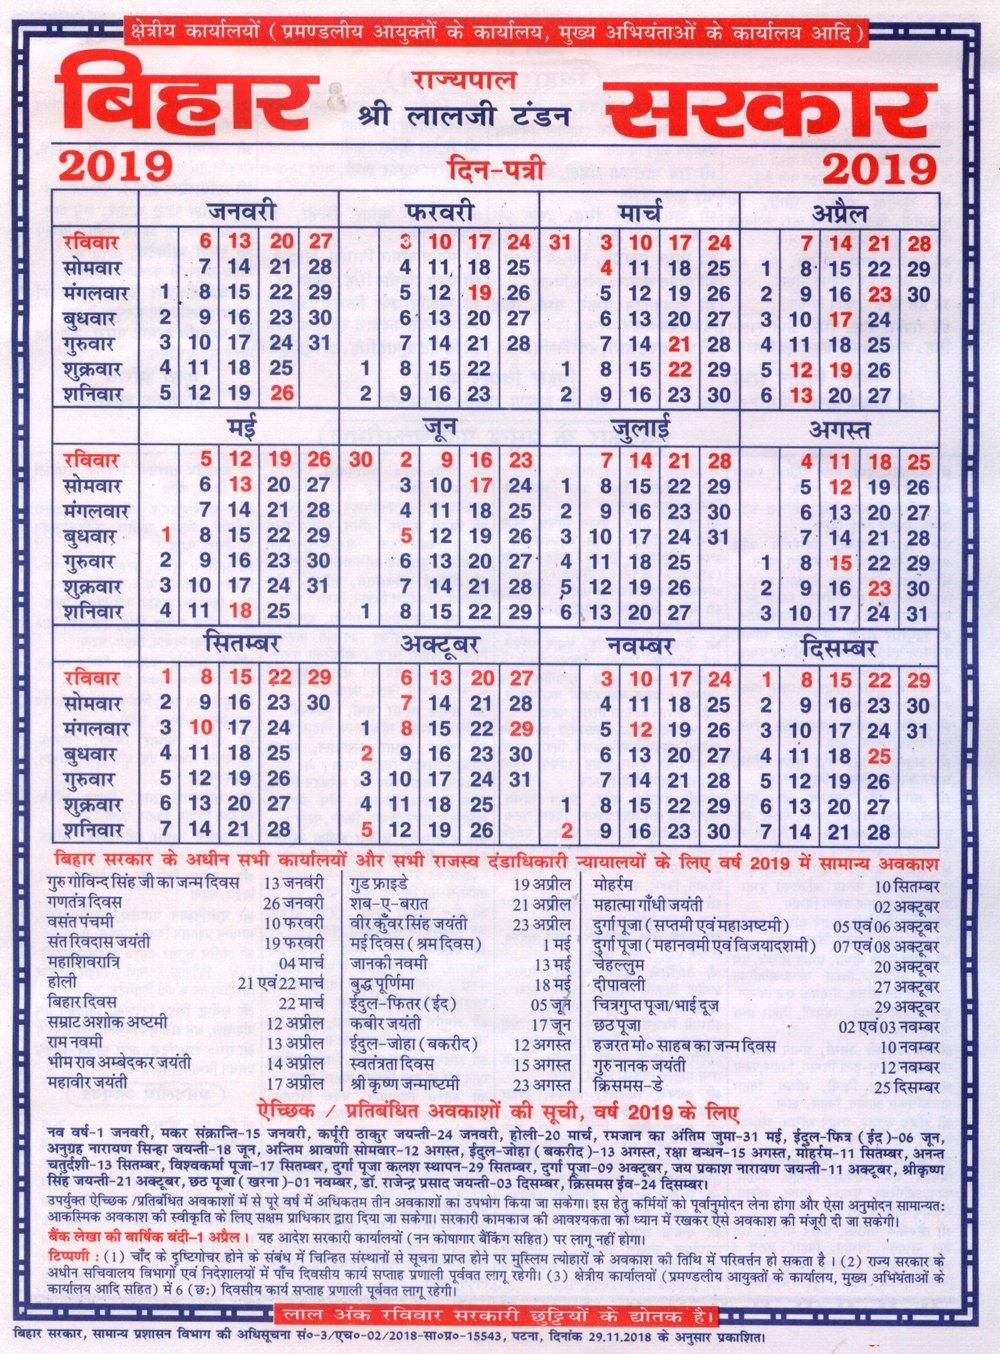 Bihar Govt. Calendar 2019, Bihar Govt. Holiday List, Holiday List Bihar Calendar 2019 Government